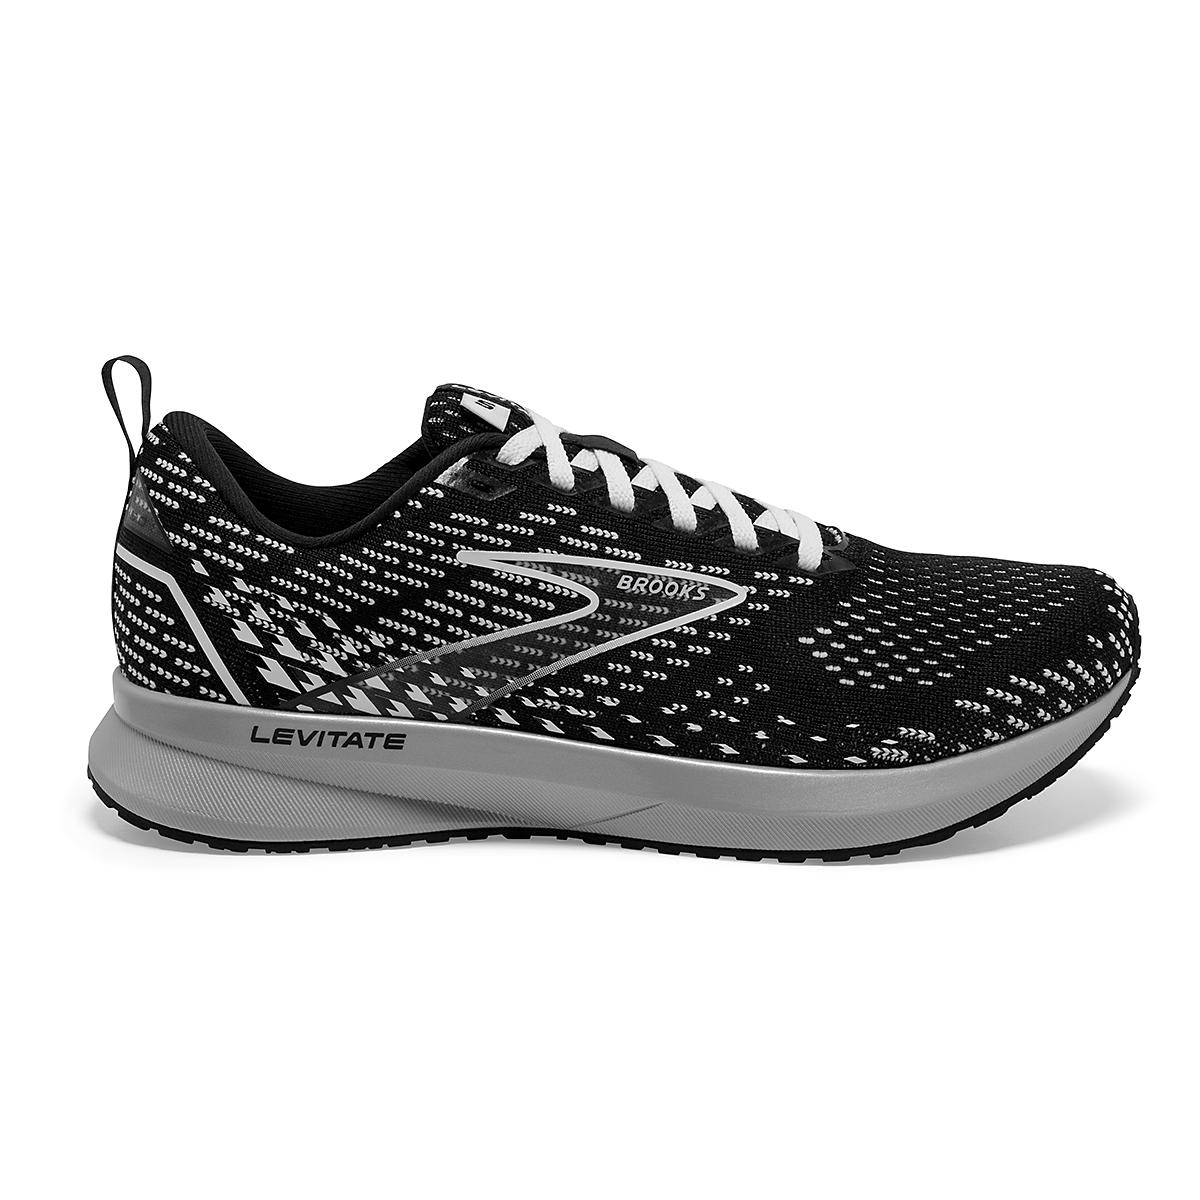 Women's Brooks Levitate 5 Running Shoe - Color: Black/Grey/White - Size: 5 - Width: Regular, Black/Grey/White, large, image 1